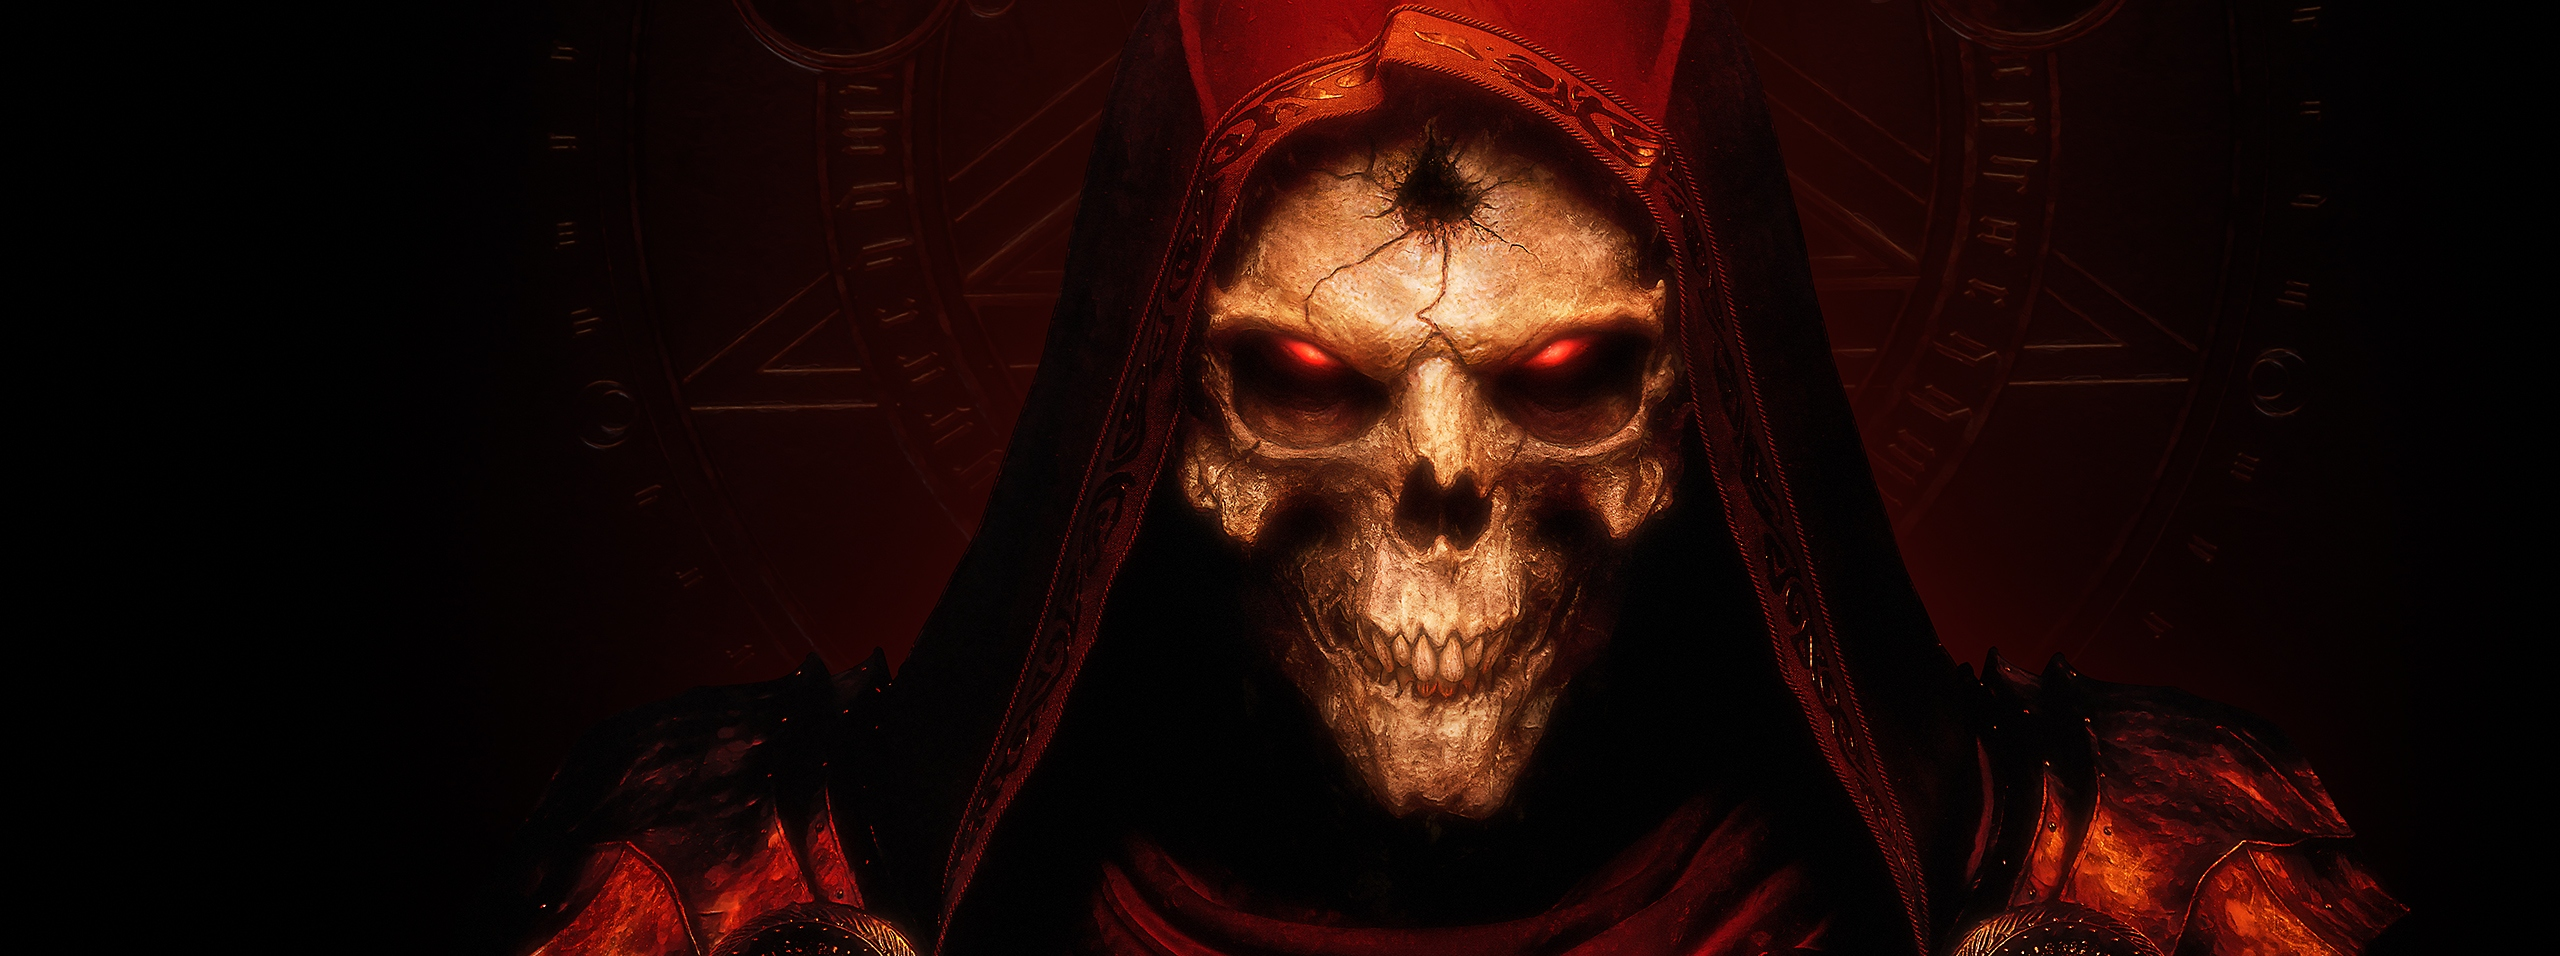 Diablo 2 Mobile Background